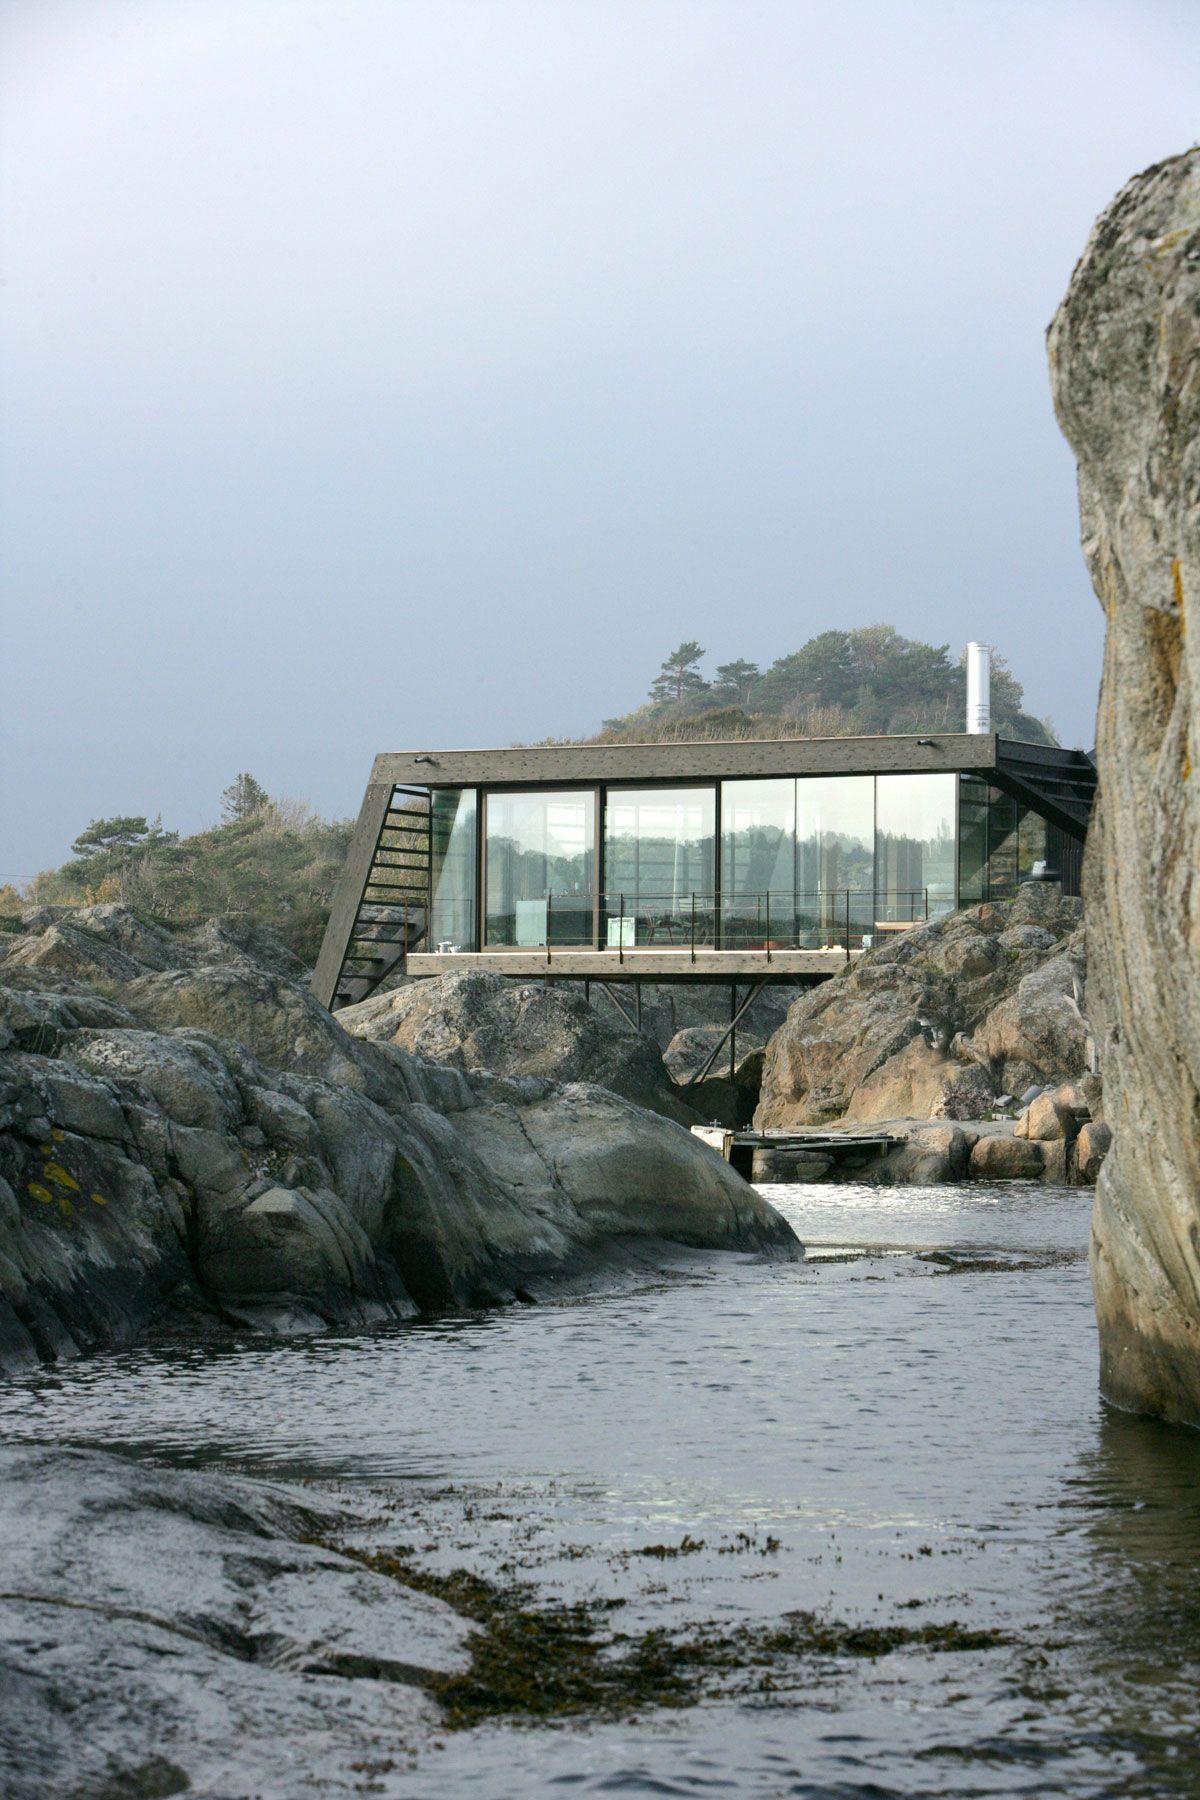 House on Stilts by Lille Aroya